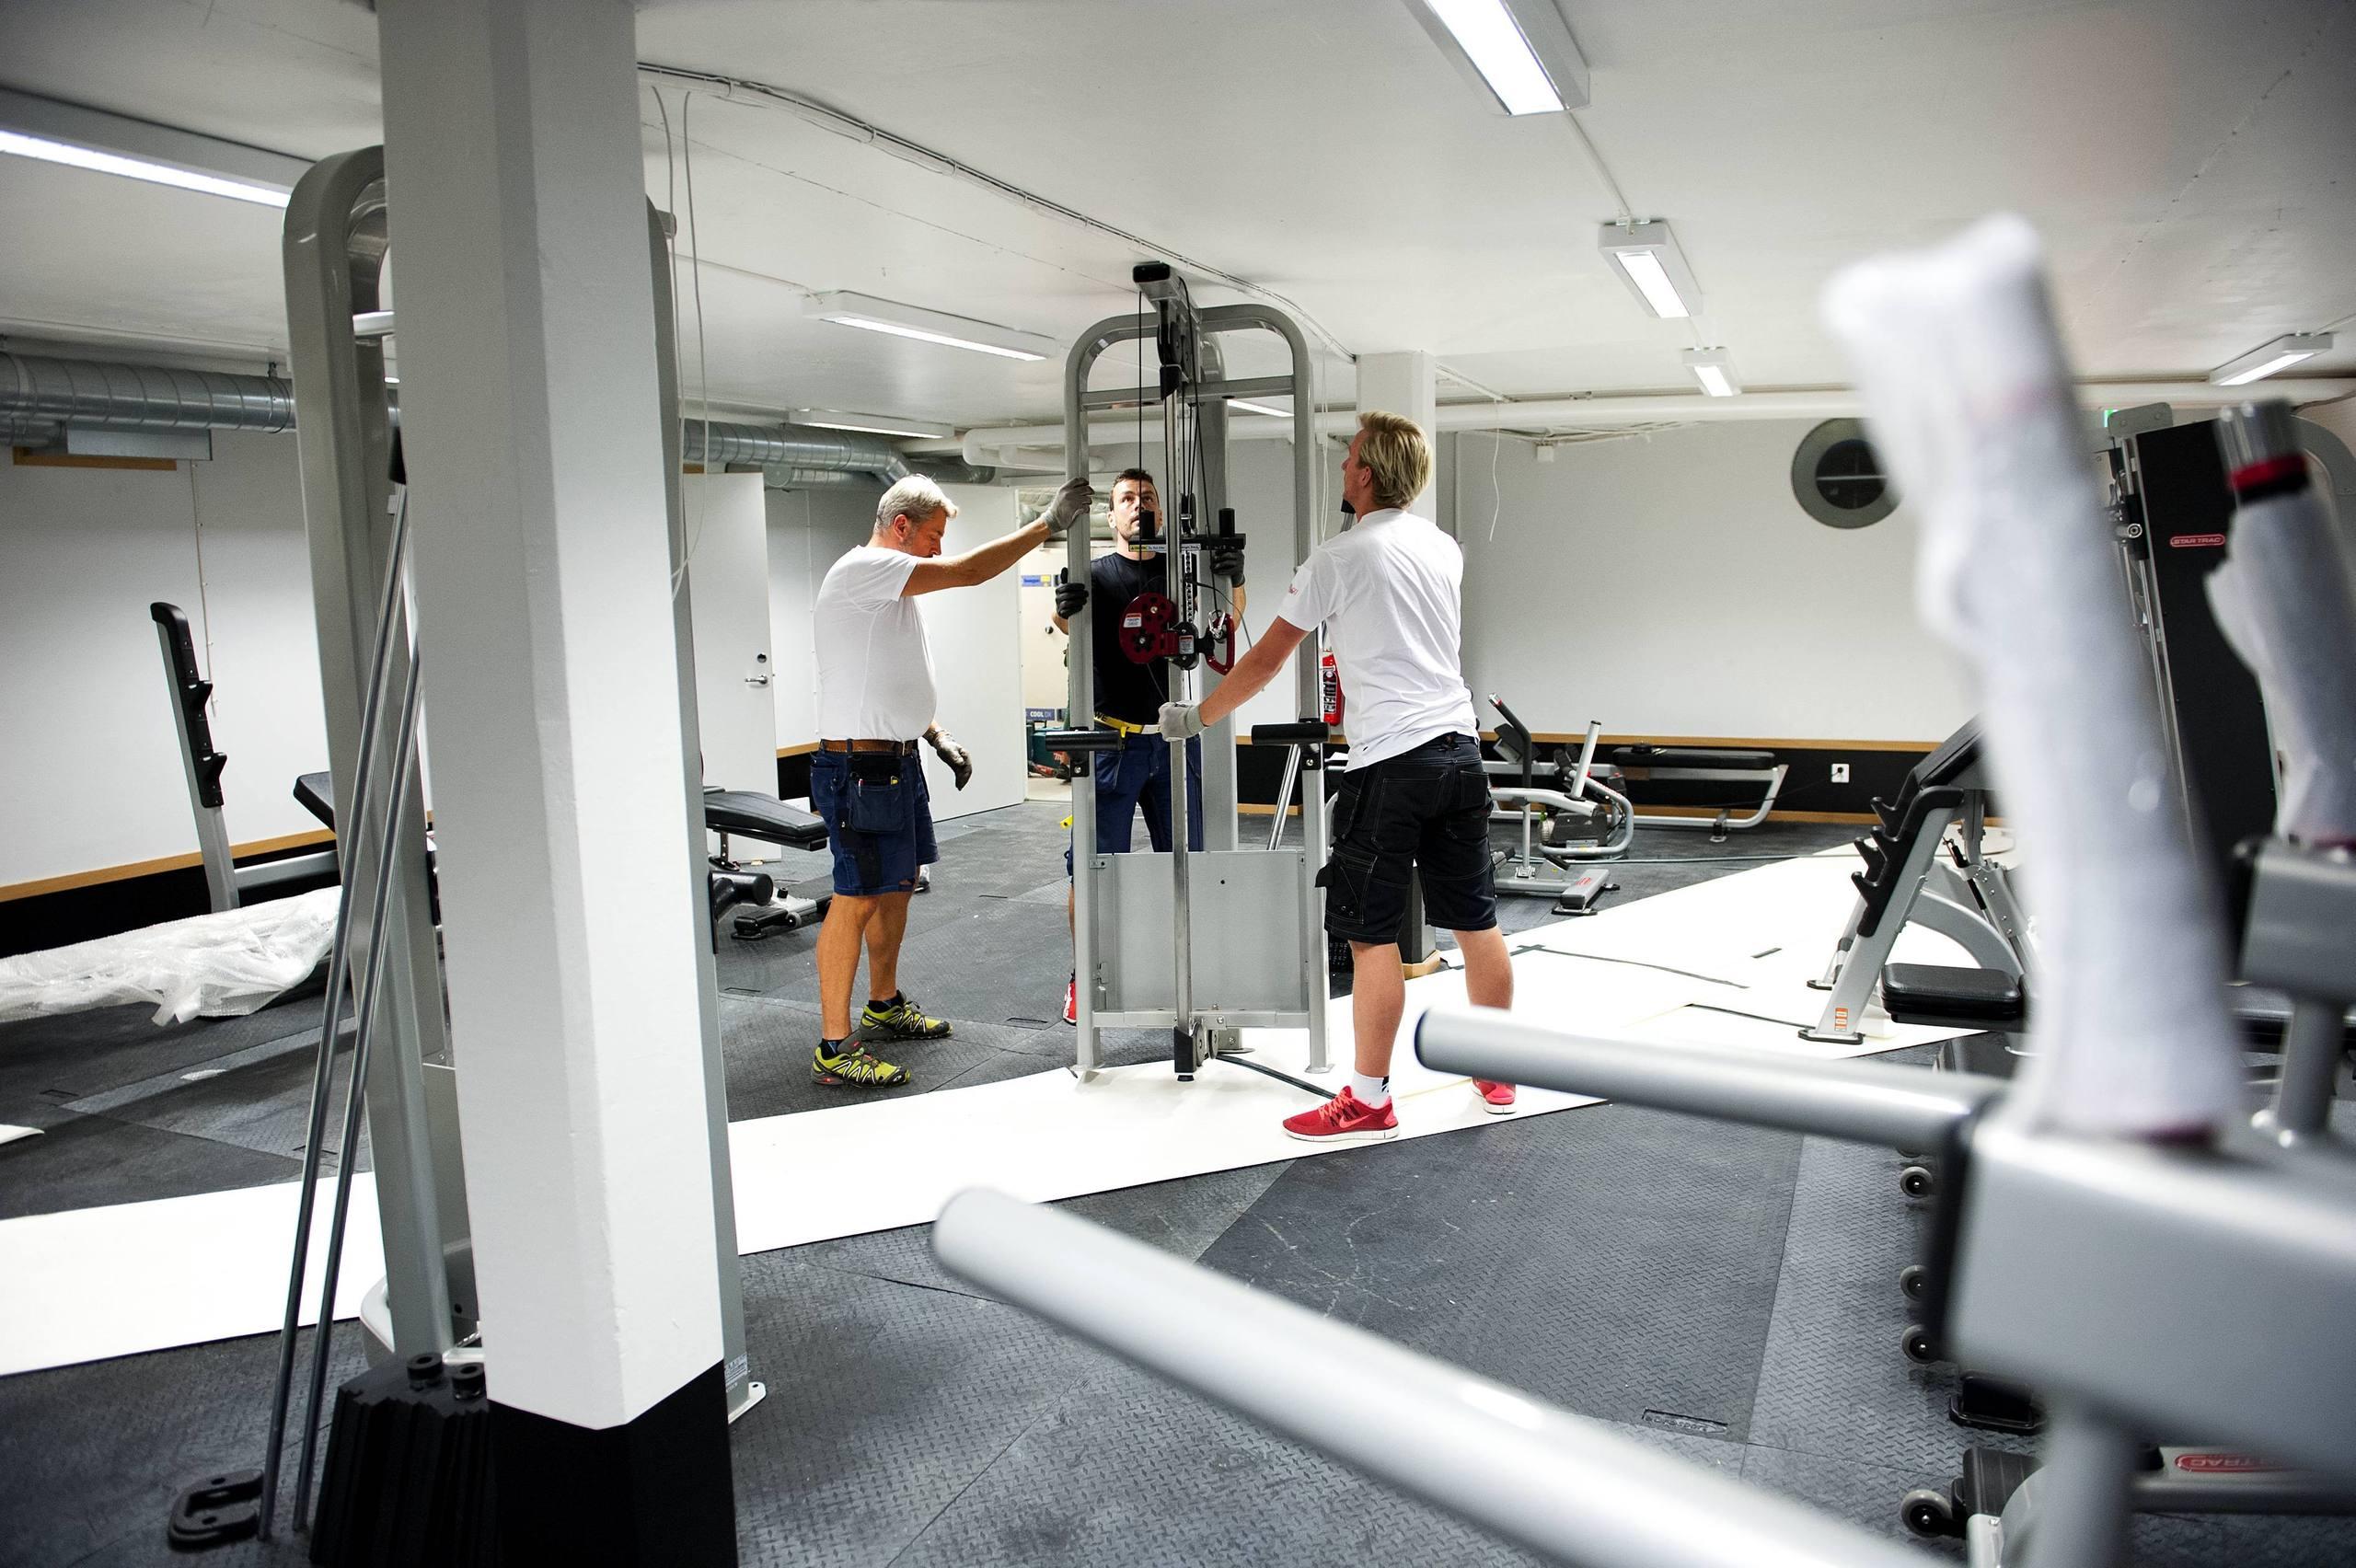 fitness 24 borlänge